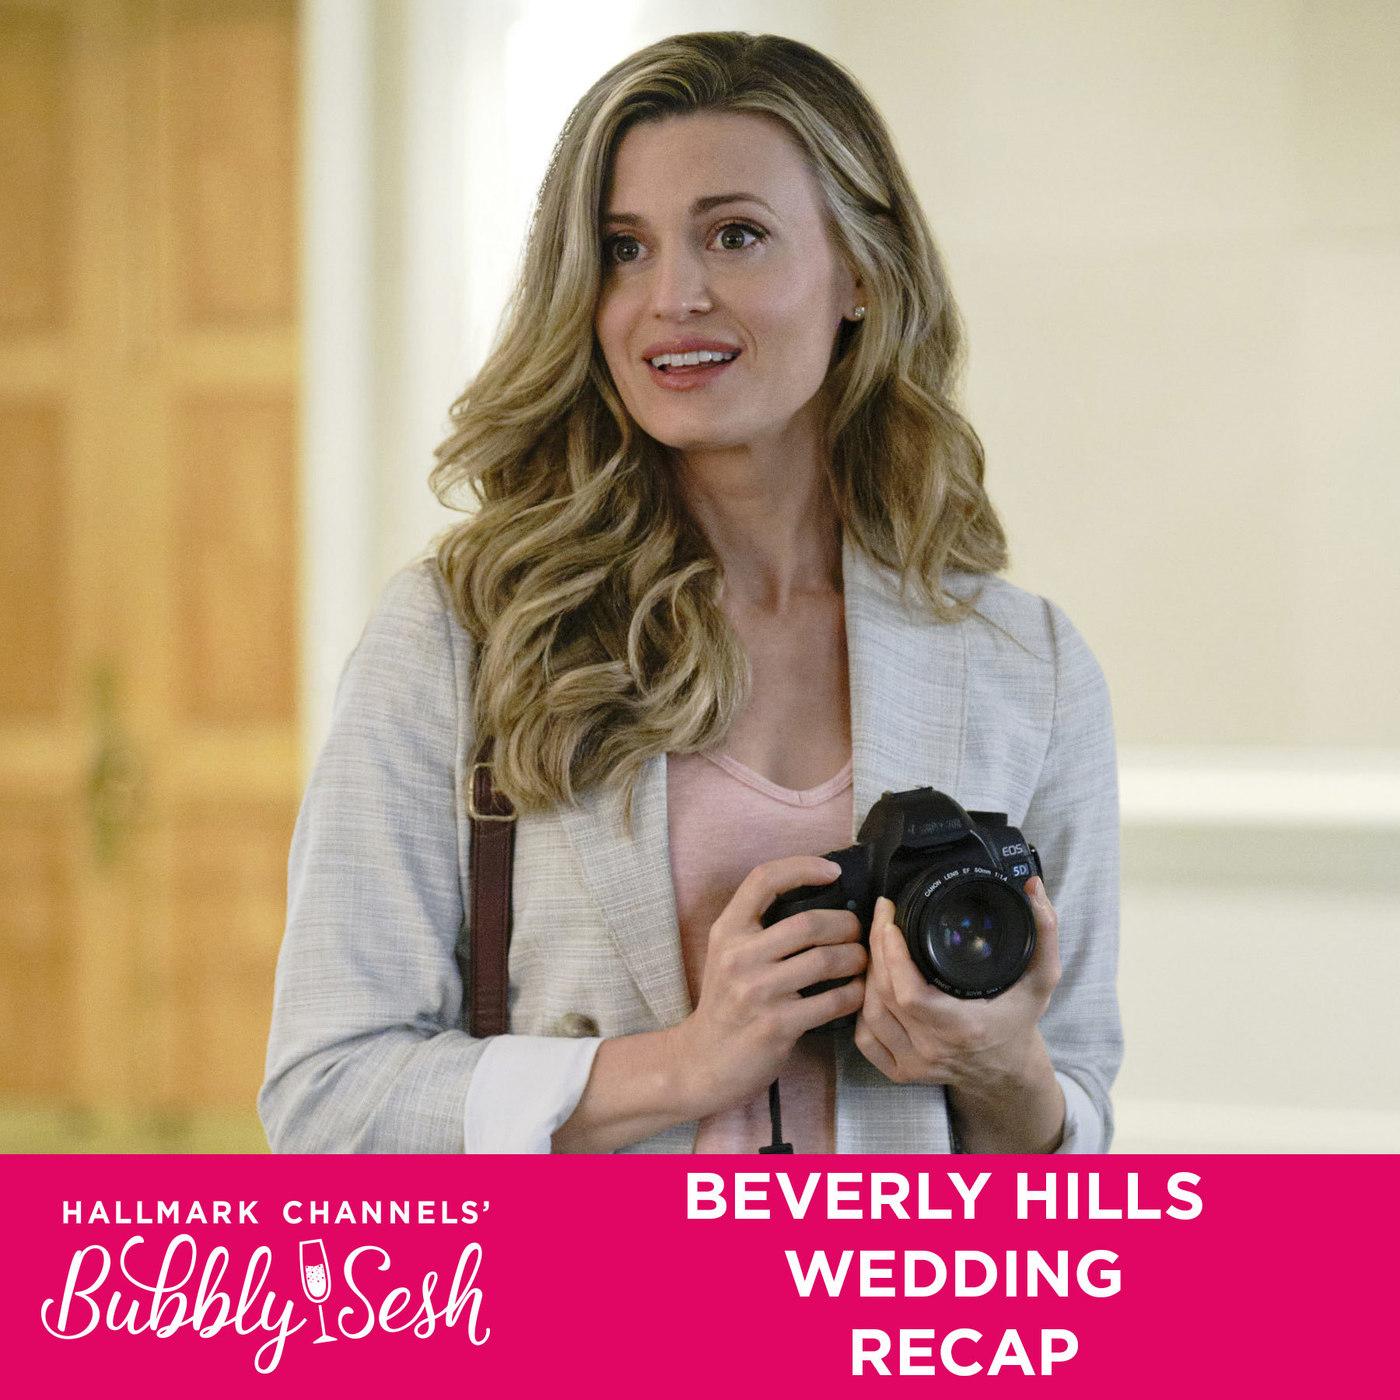 Beverly Hills Wedding Recap